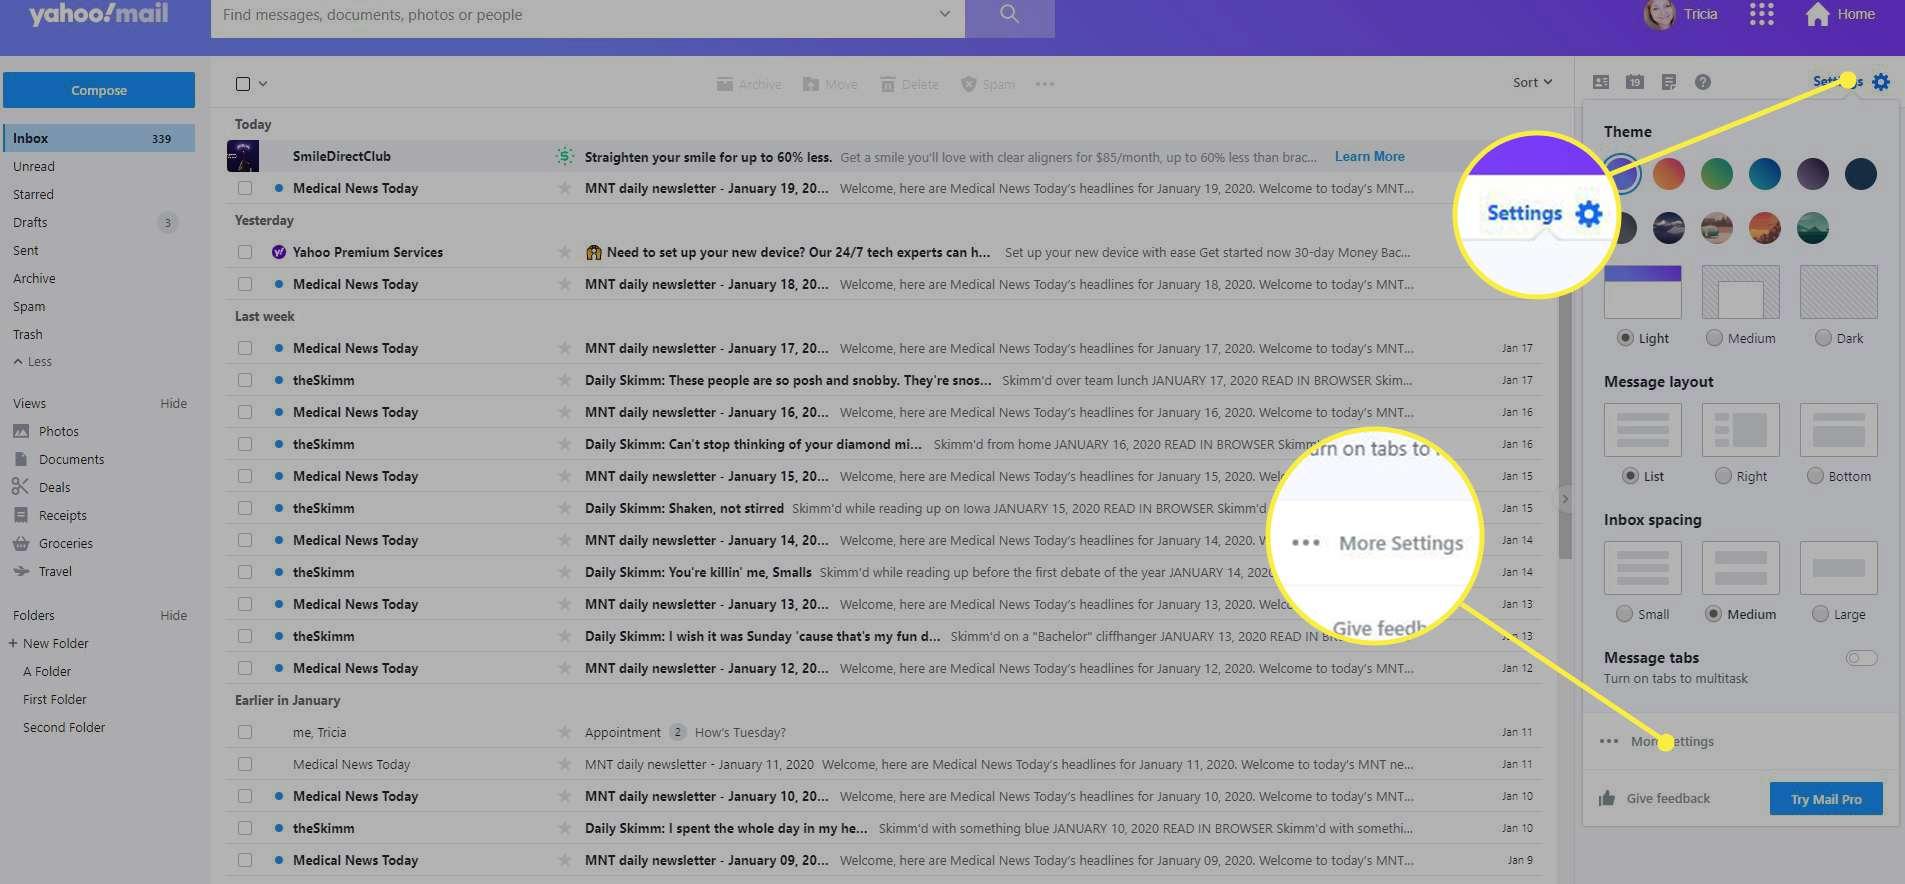 Settings > More Settings in Yahoo Mail